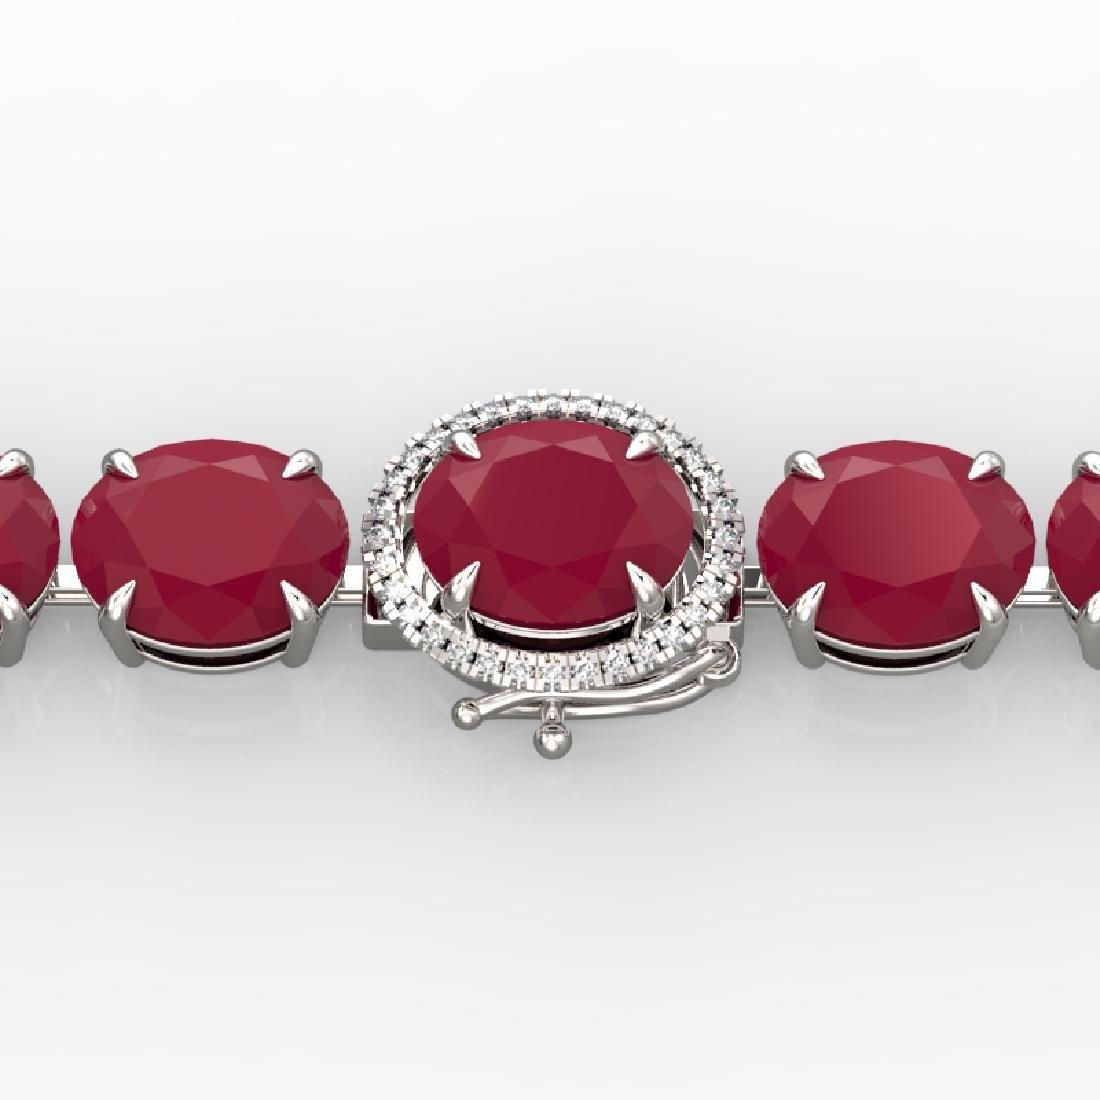 75 CTW Ruby & Micro Pave VS/SI Diamond Halo Bracelet